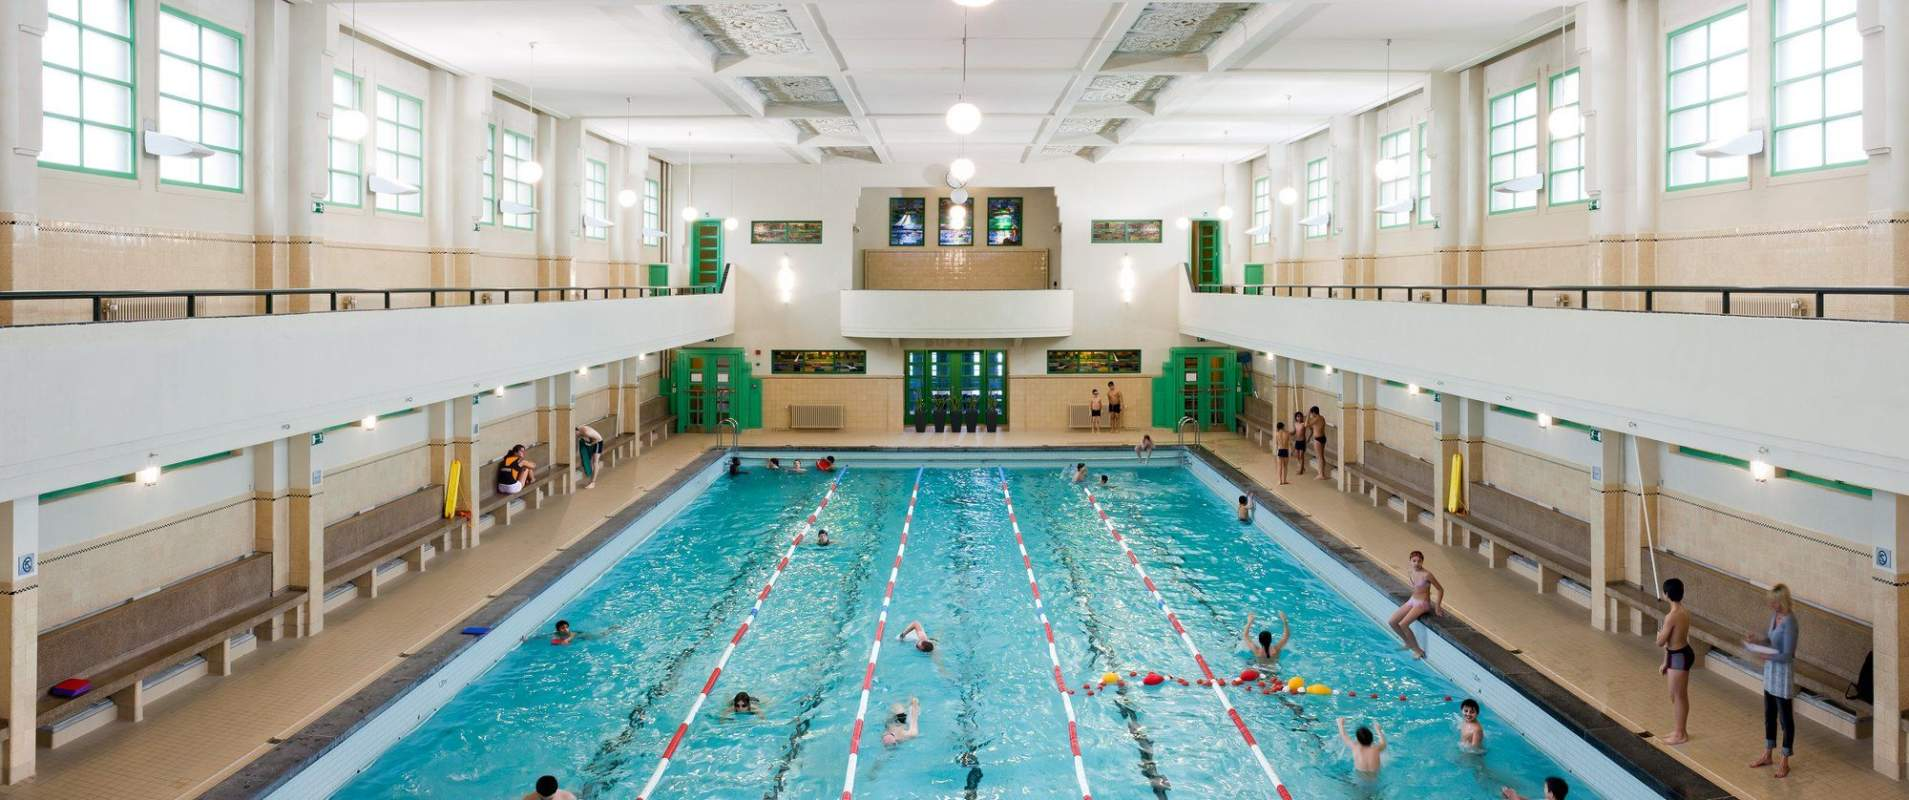 Zwembadveldstraat K Borghouts